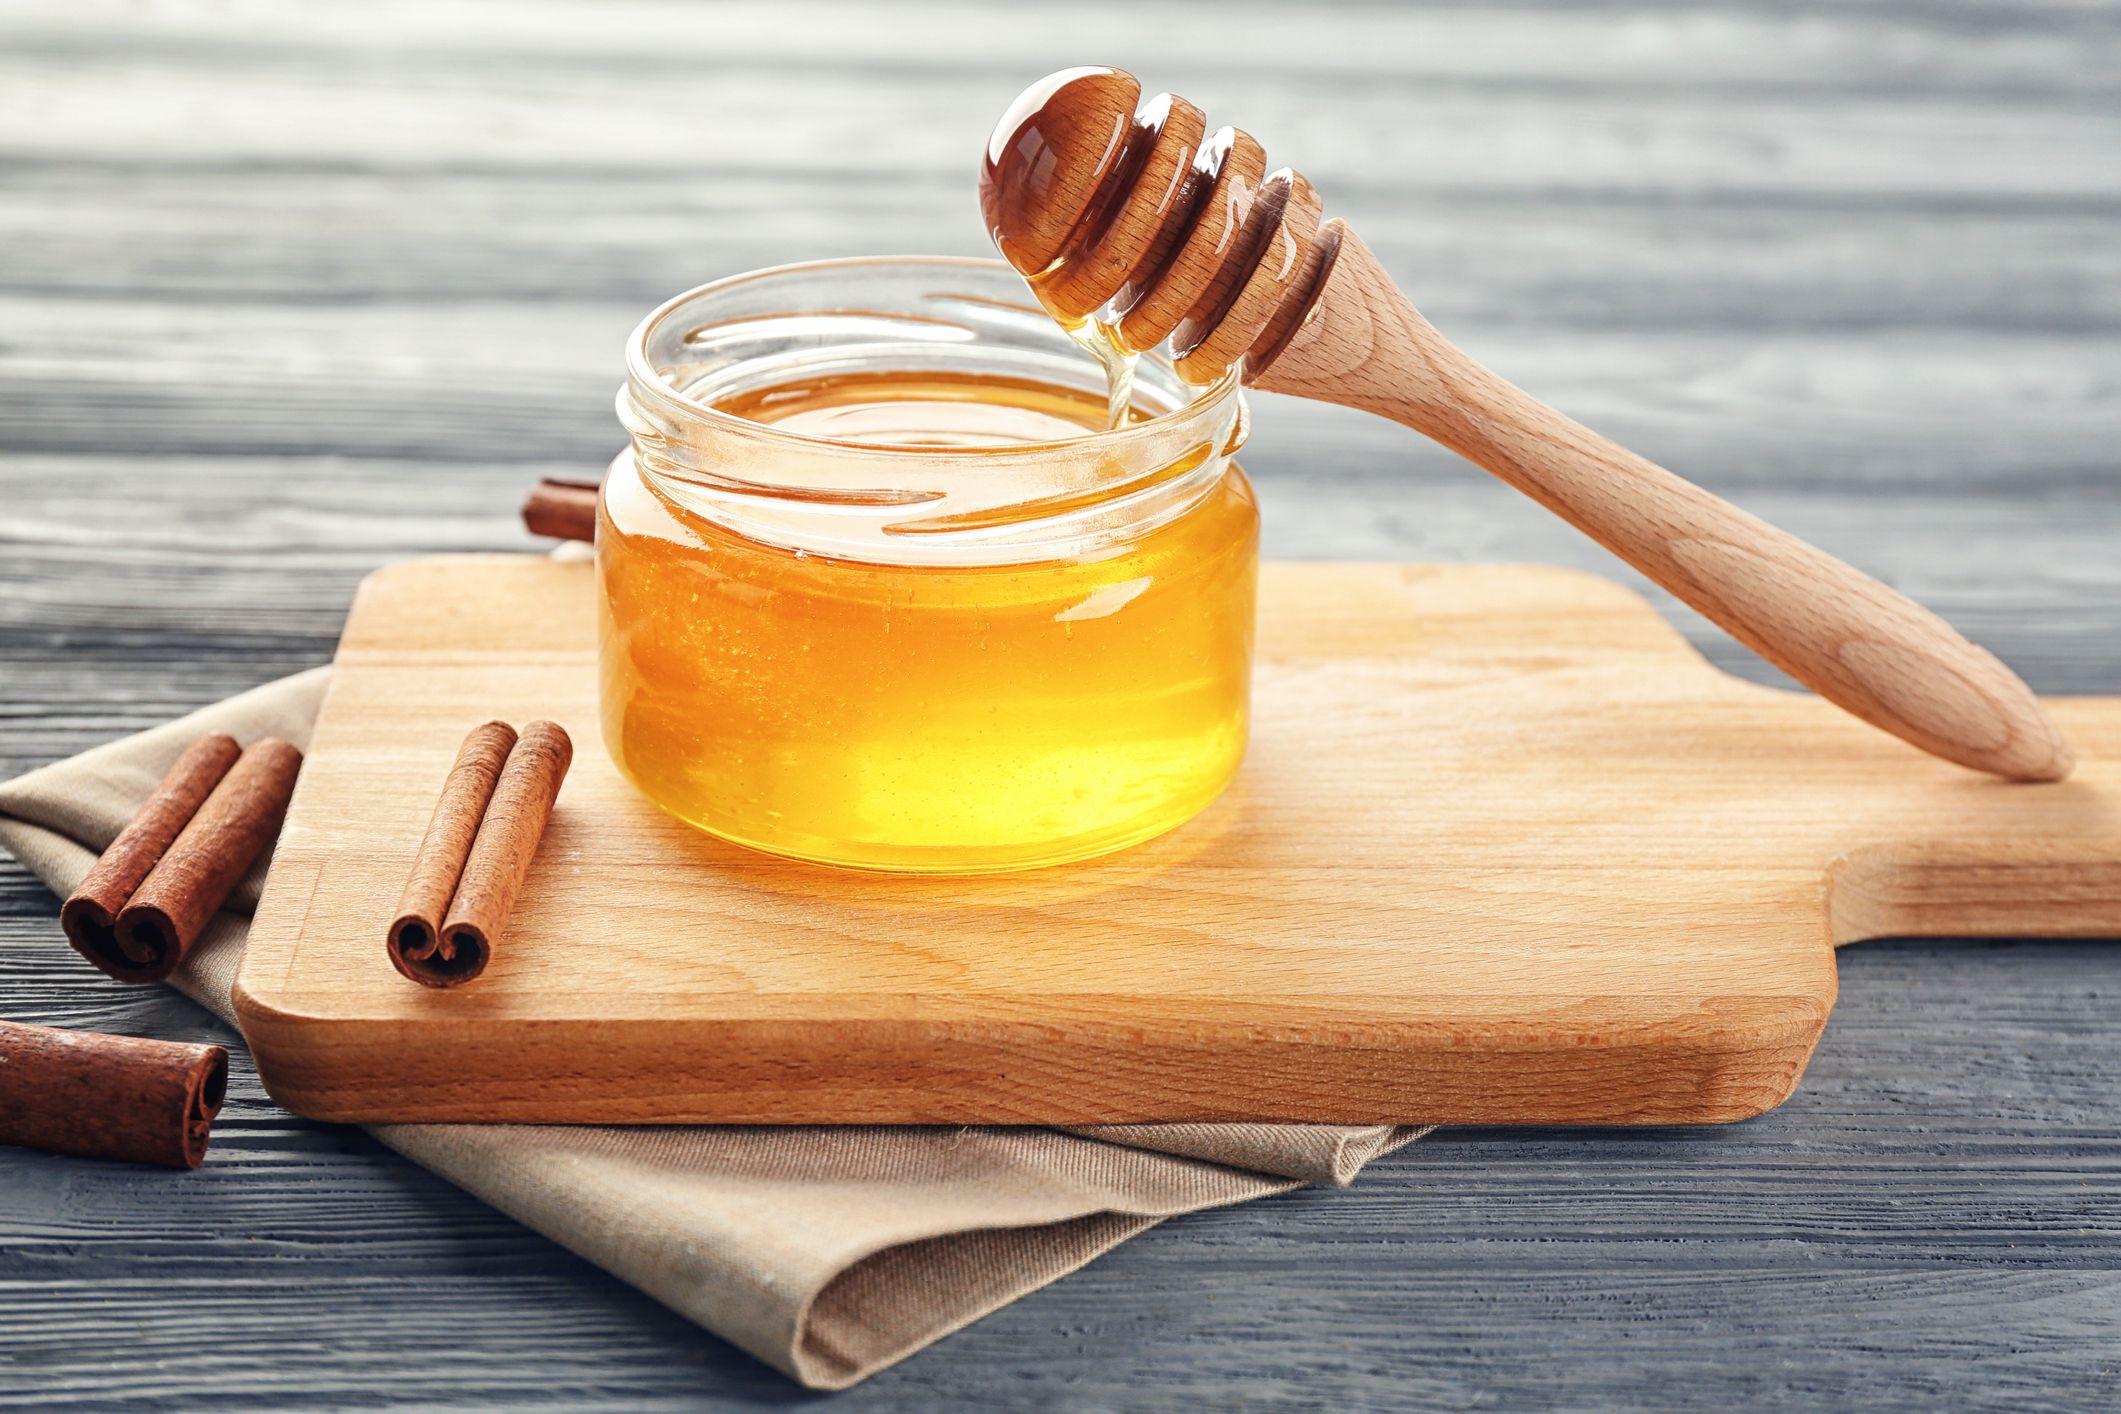 мед с корицей картинки фасады кухонных